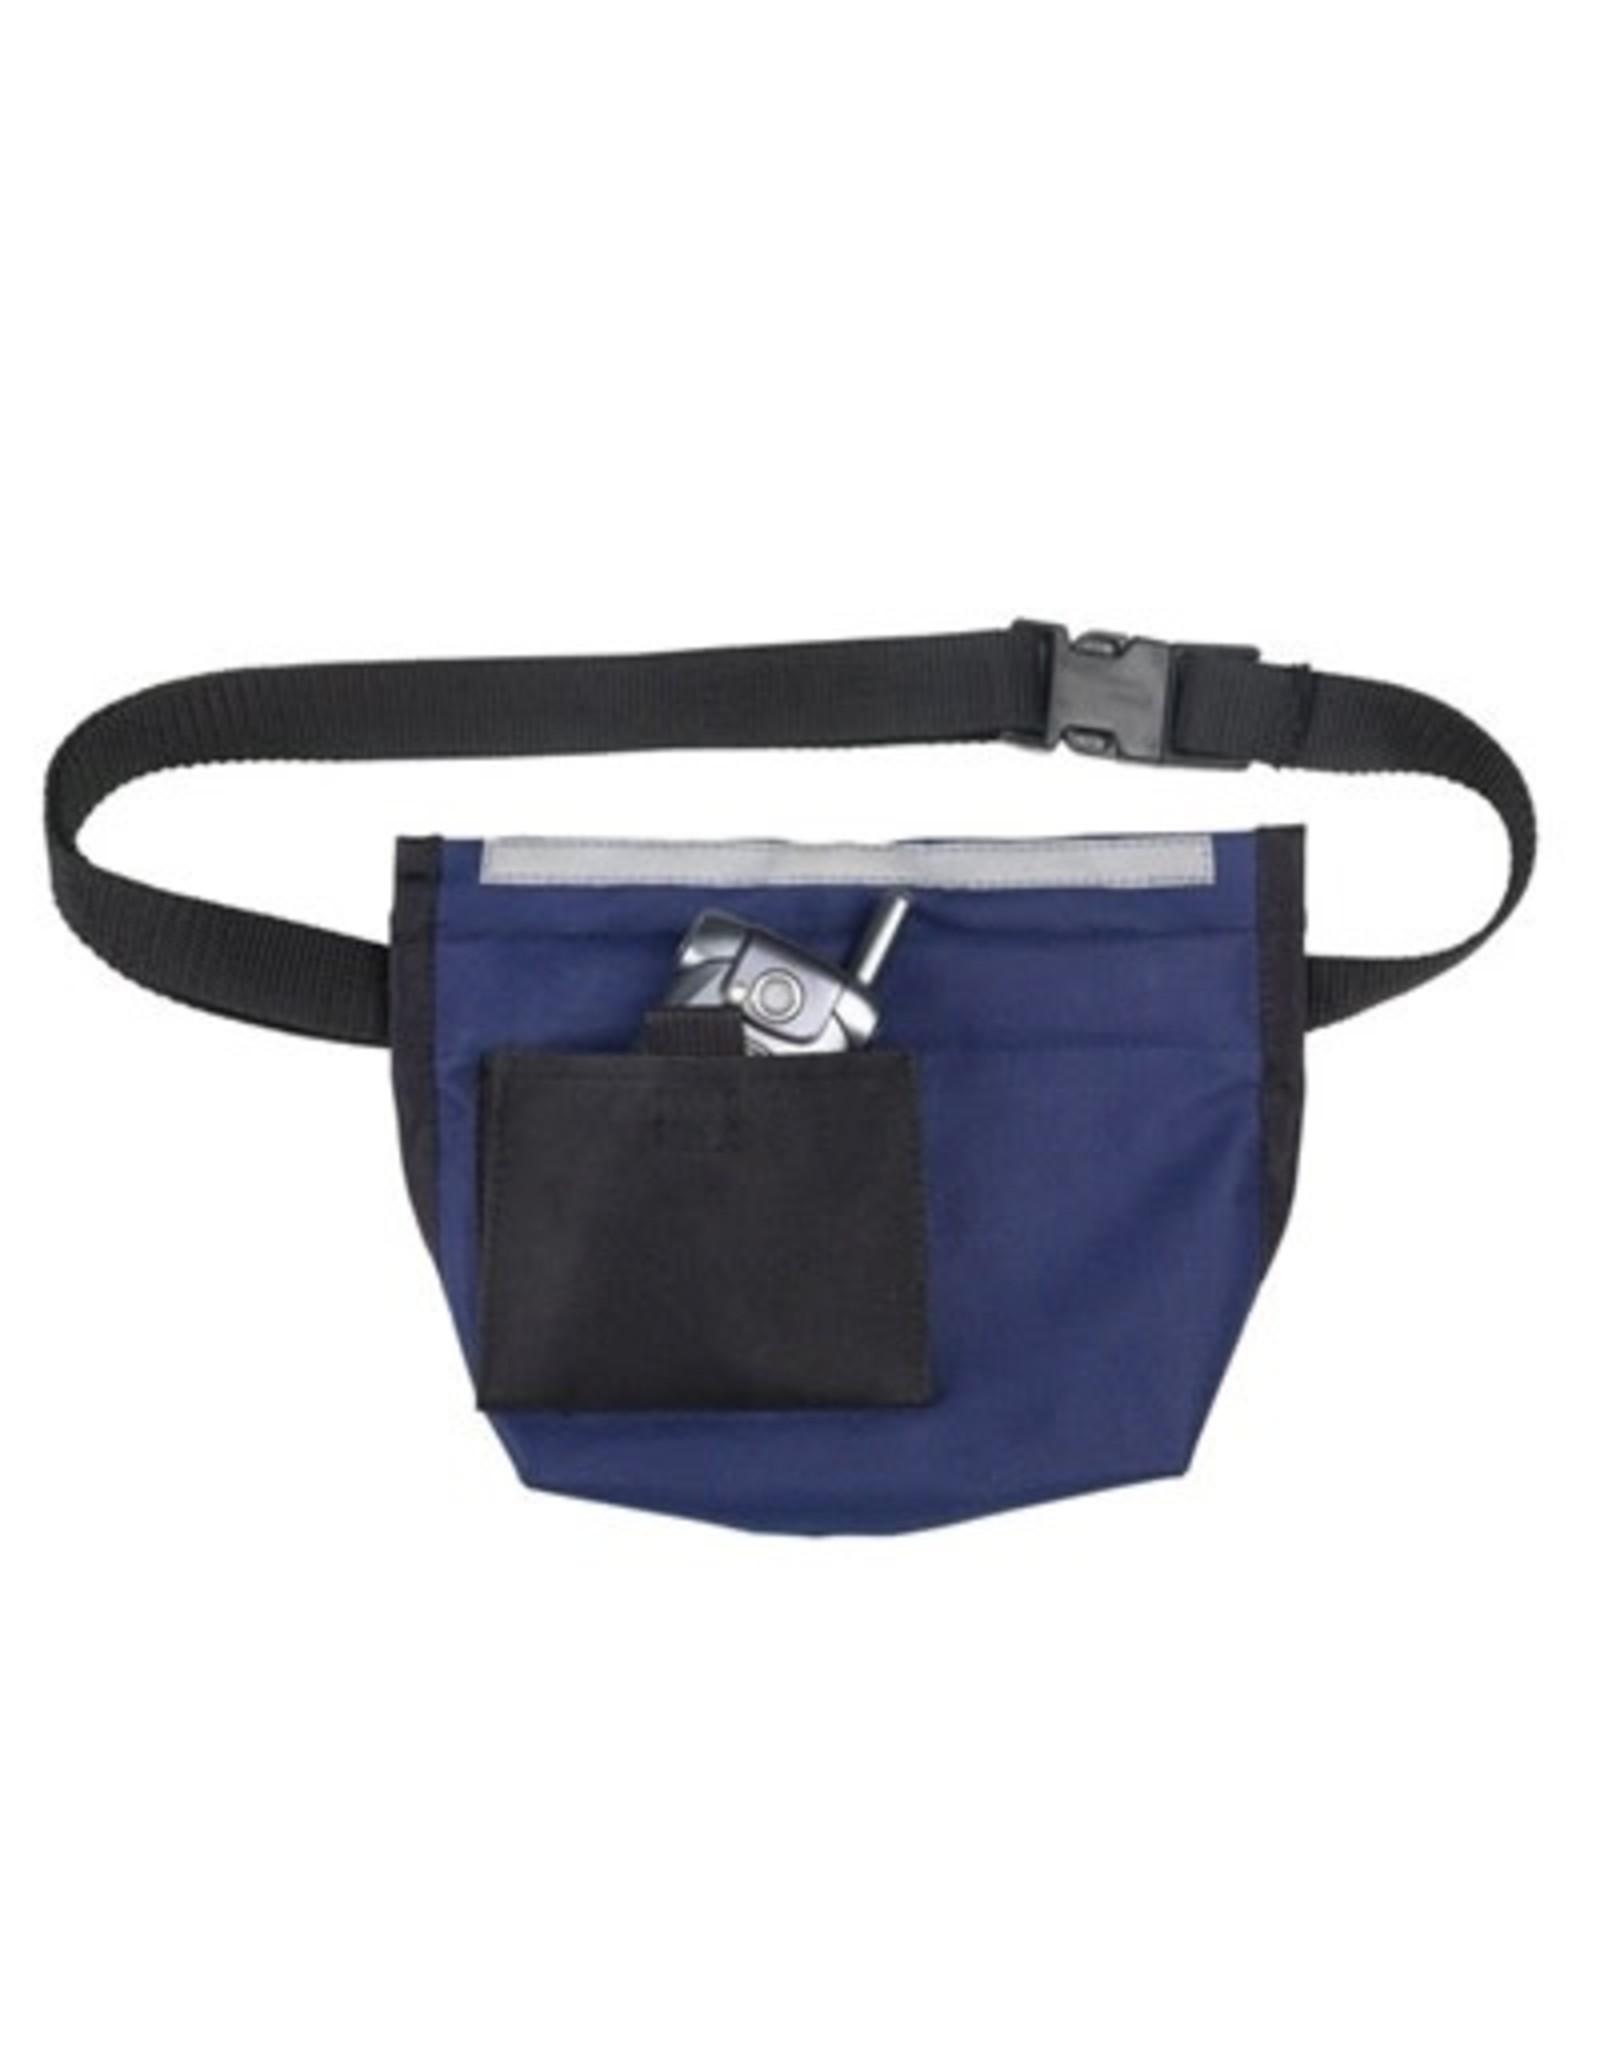 Guardian Gear Guardian Gear Training Treat Bag: Blue, os